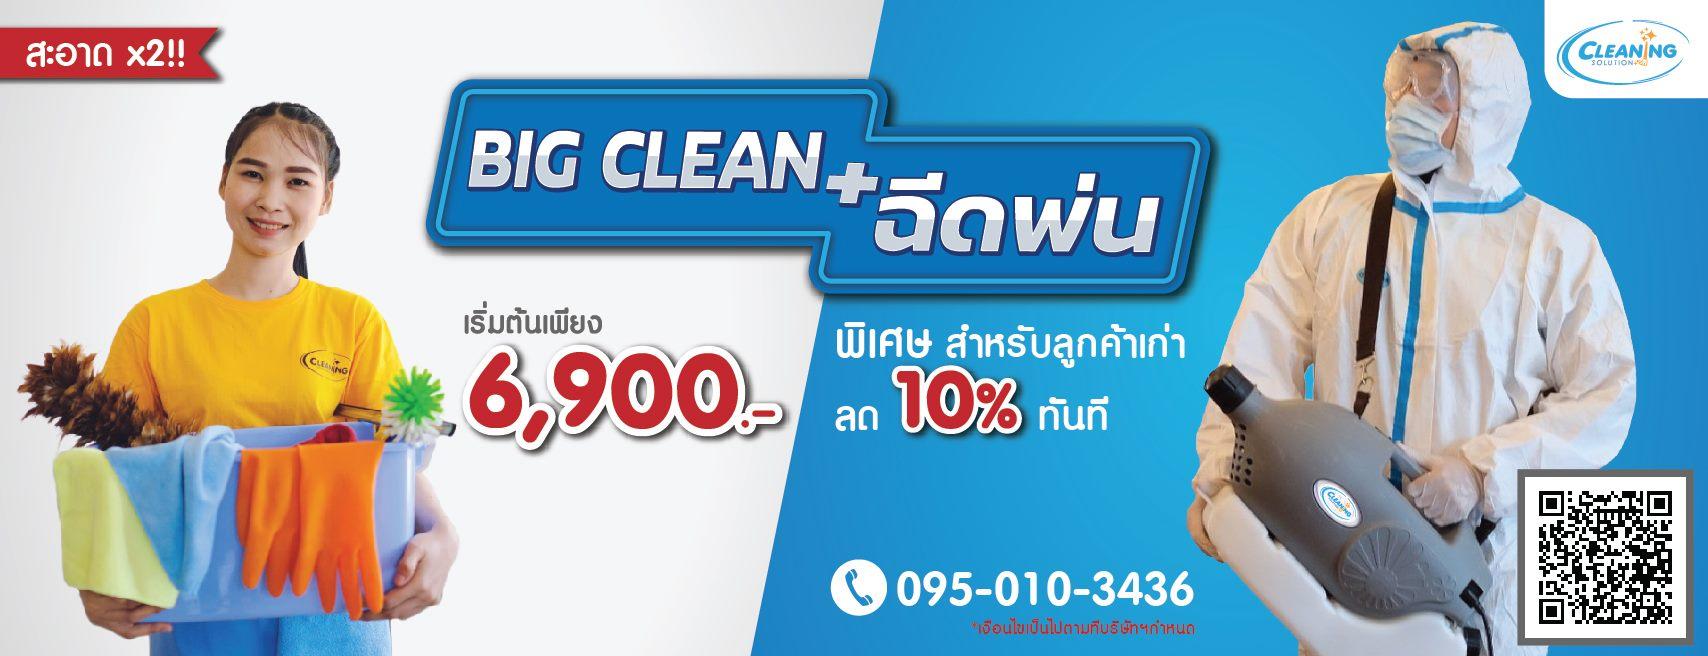 Cleaning Solution บริษัททำความสะอาดและบริการทำความสะอาดครบวงจร